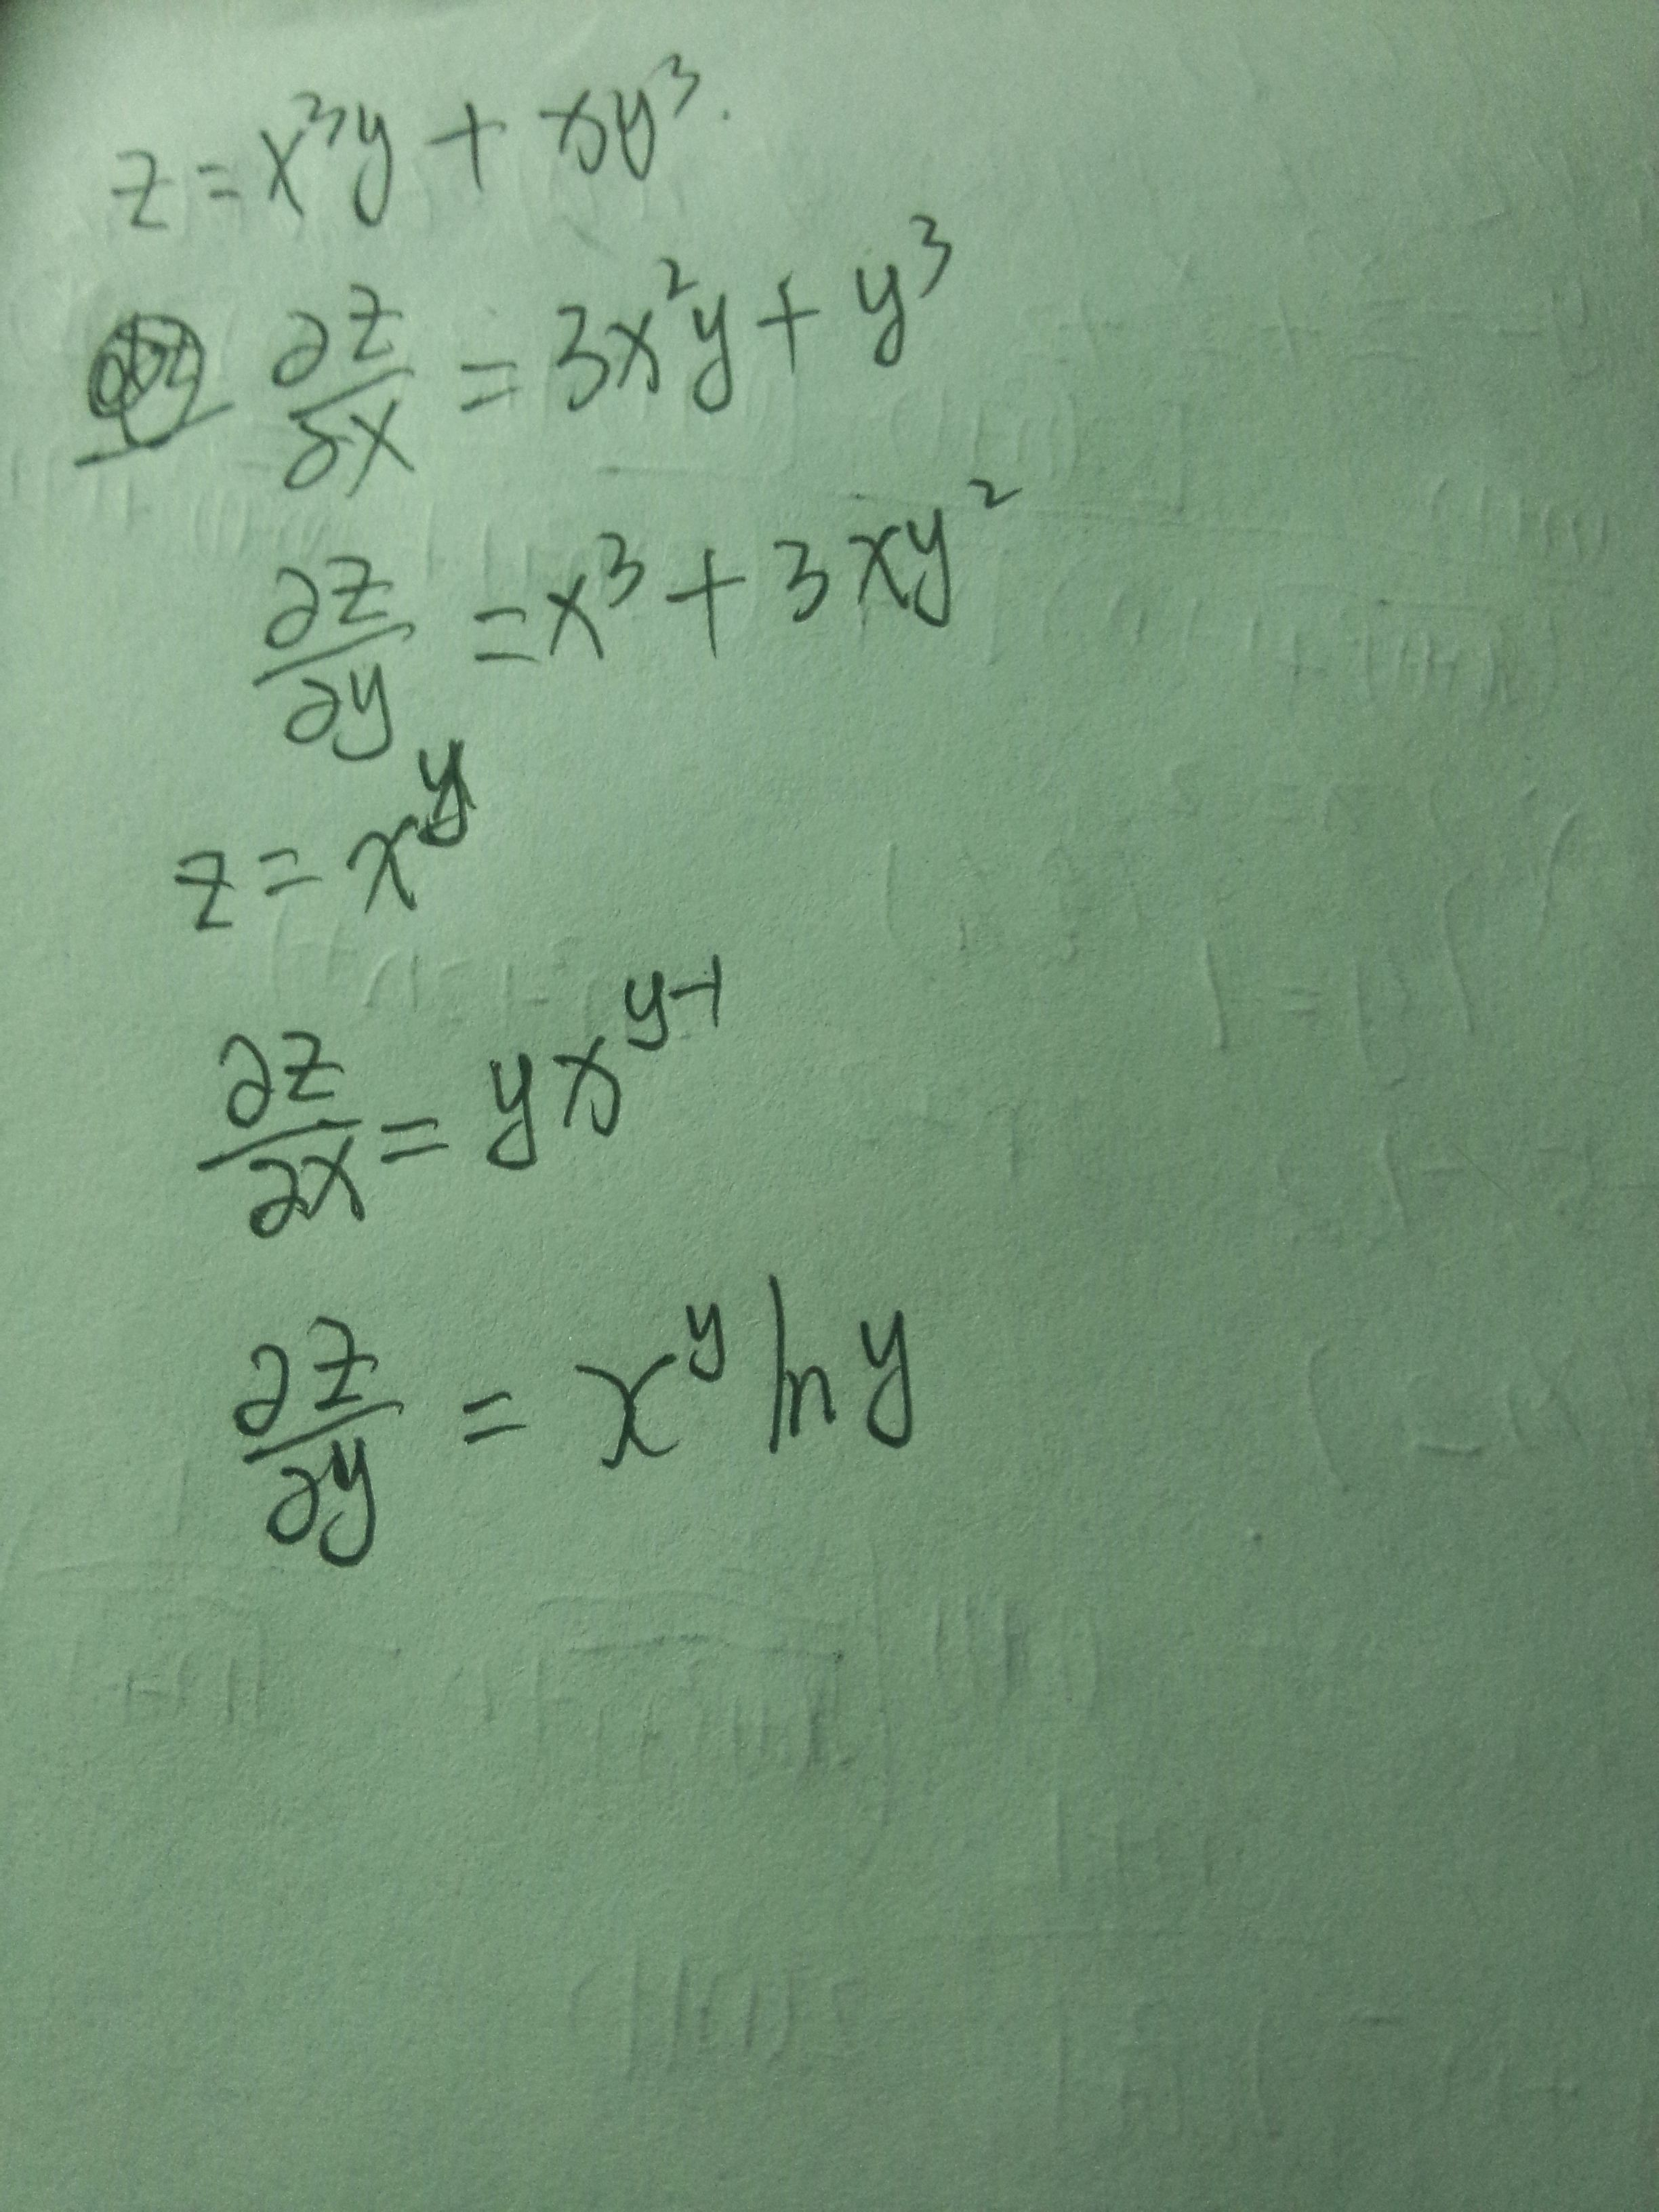 求xy^3=x y